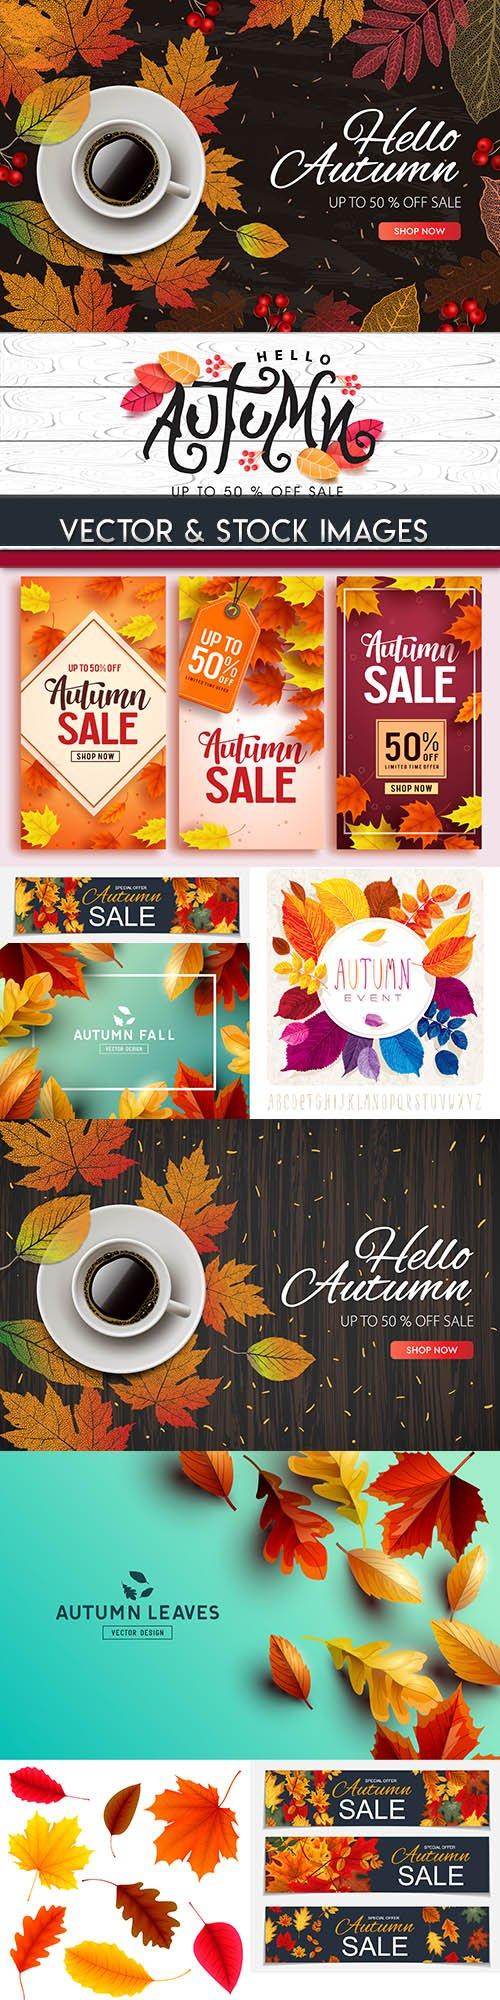 Autumn leaves decorative colourful background 2